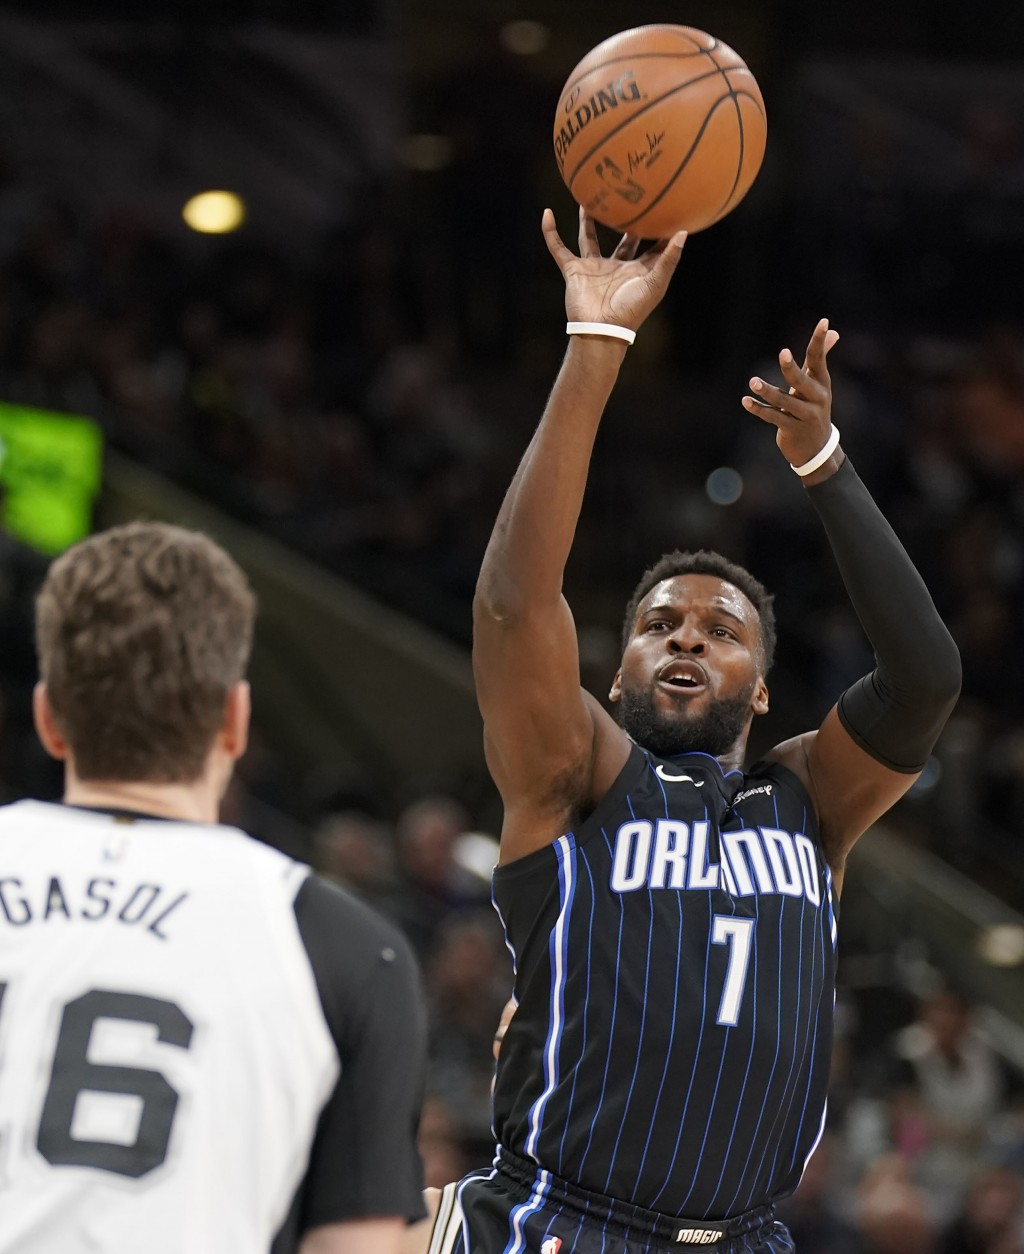 Orlando Magic's Shelvin Mack (7) shoots against San Antonio Spurs' Pau Gasol during the first half of an NBA basketball game, Tuesday, March 13, 2018,